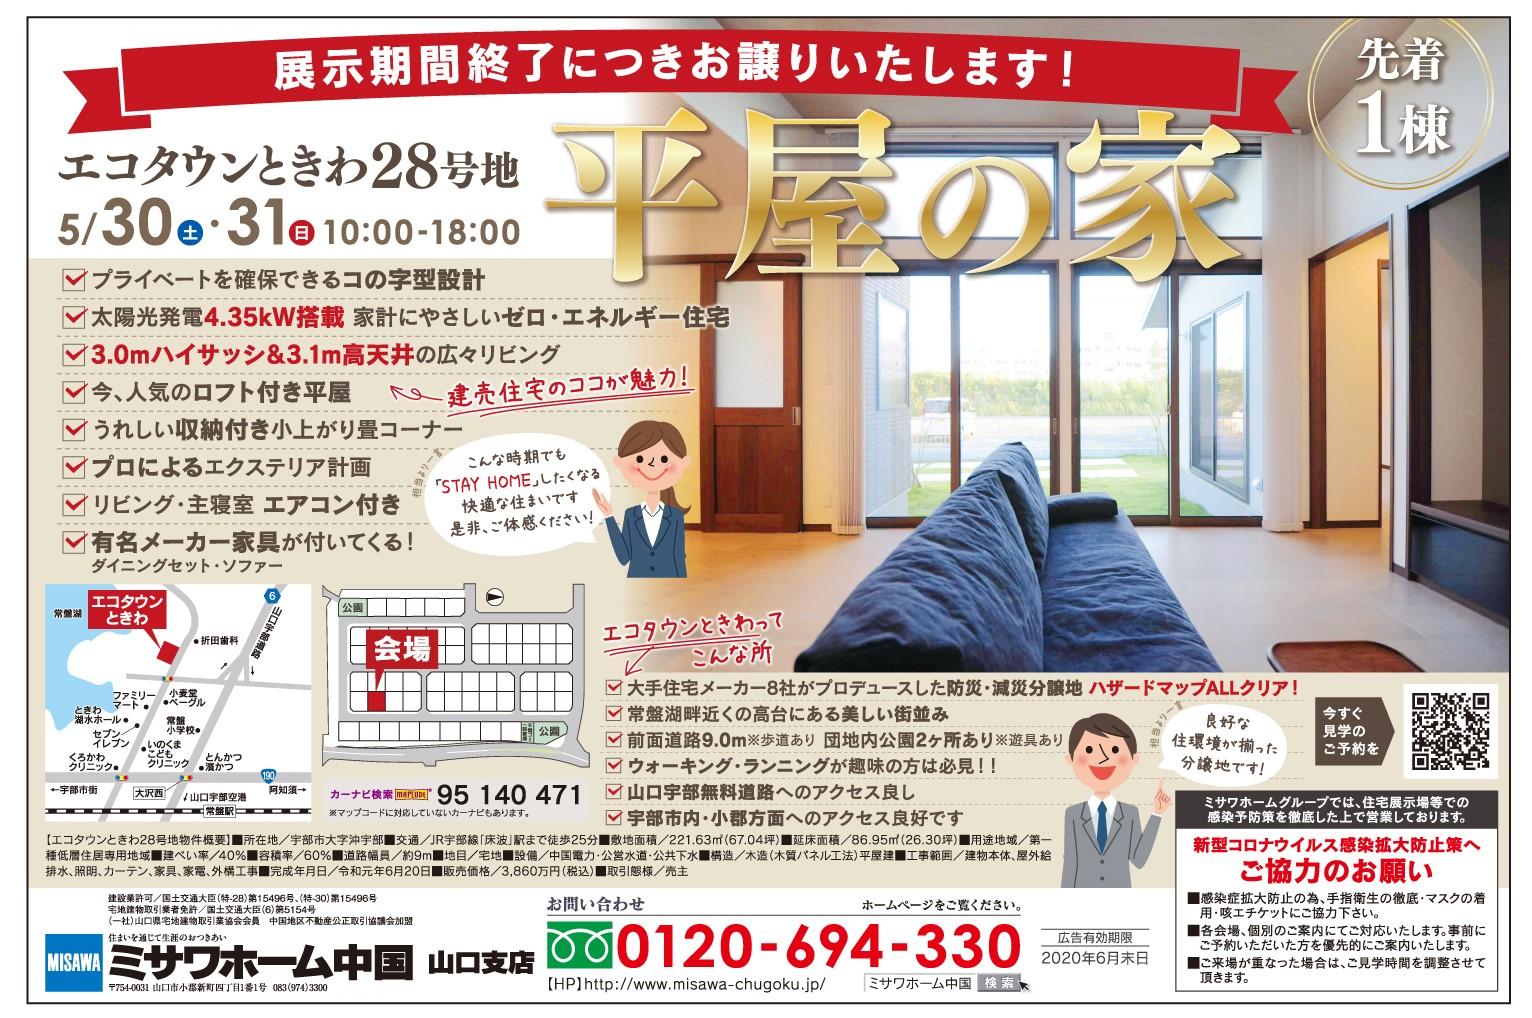 画像:5/30(土)31(日)平屋の家見学会